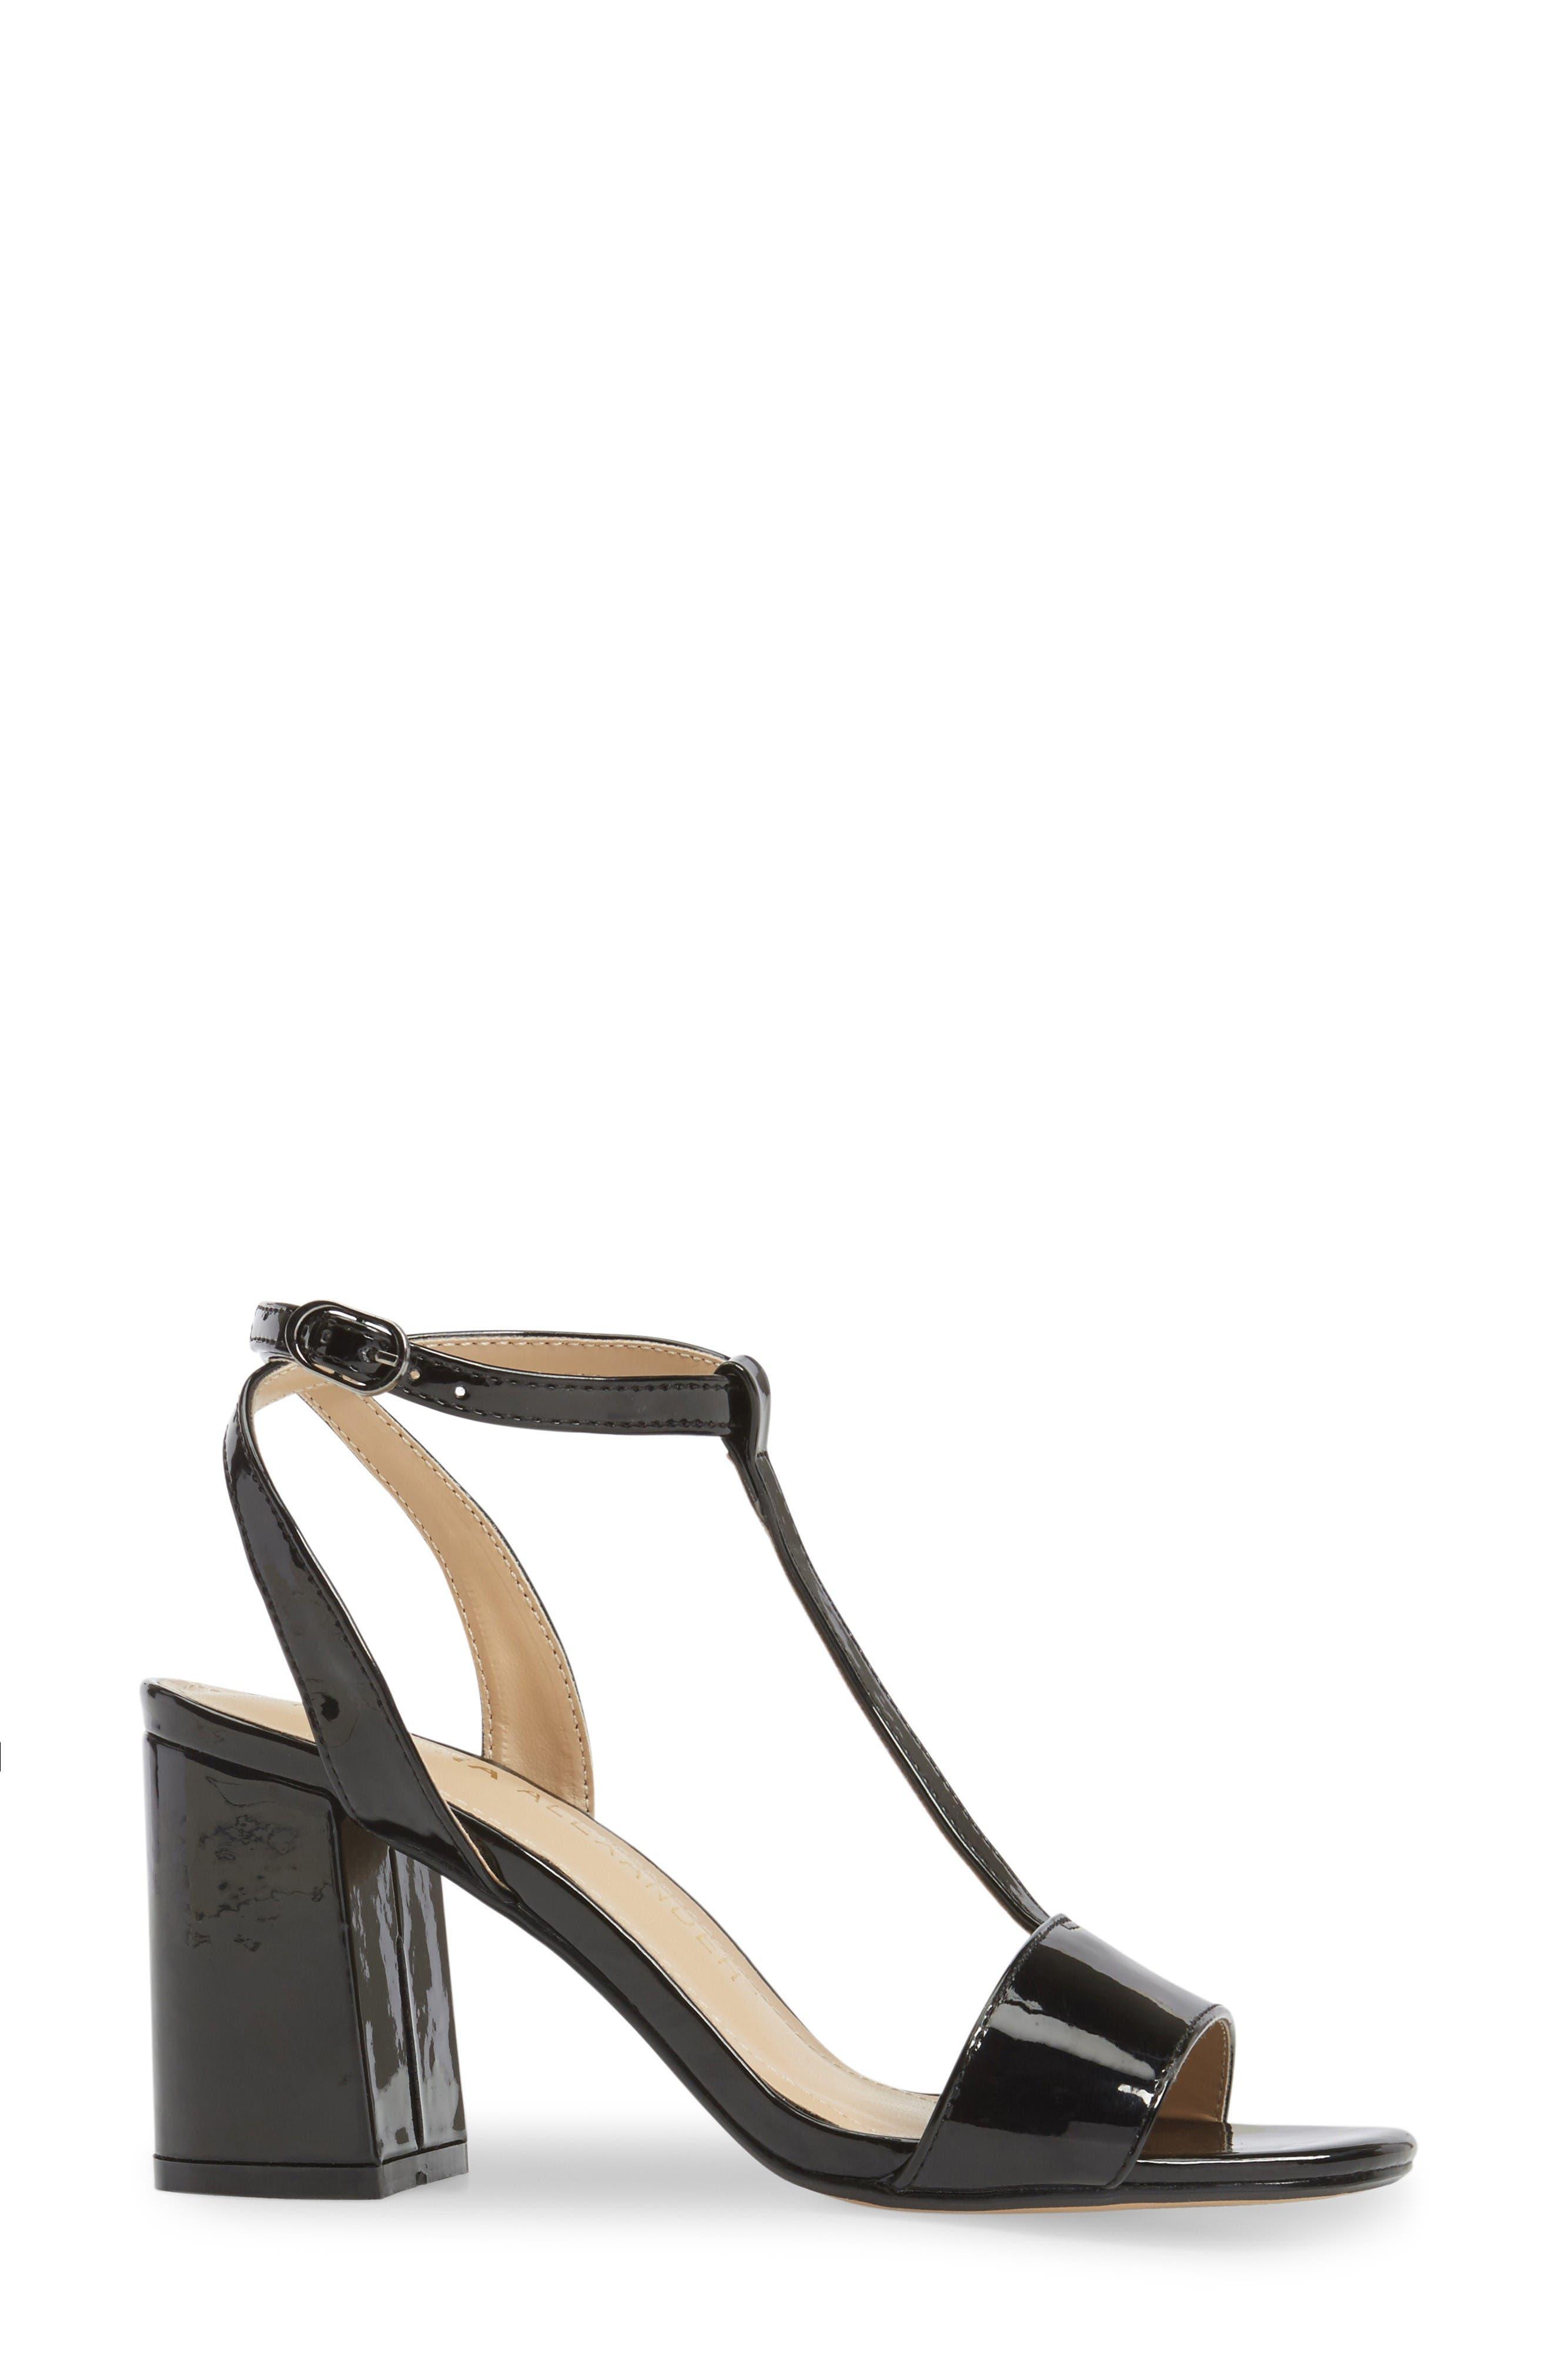 Ditaa T-Strap Sandal,                             Alternate thumbnail 3, color,                             Black Faux Patent